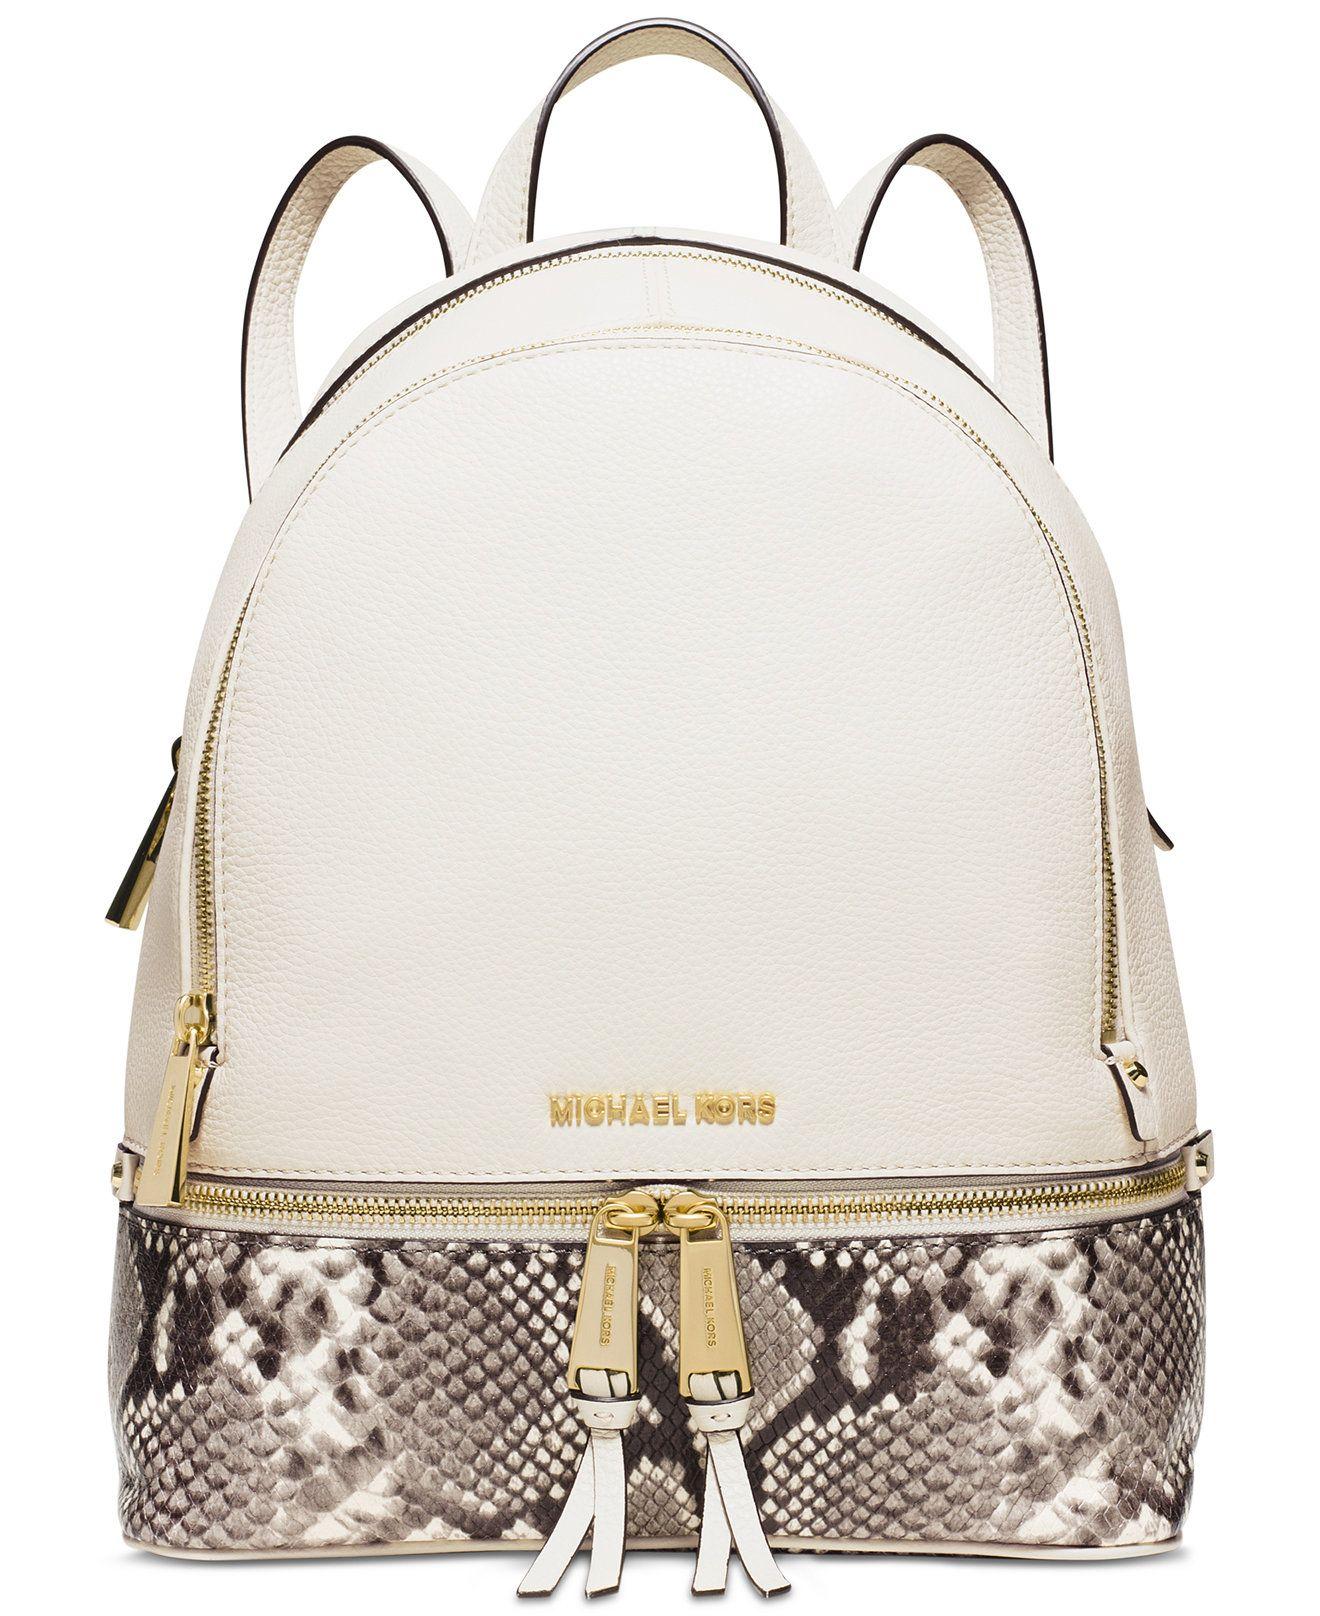 MICHAEL Michael Kors Rhea Zip Medium Backpack - Handbags & Accessories - Macy's